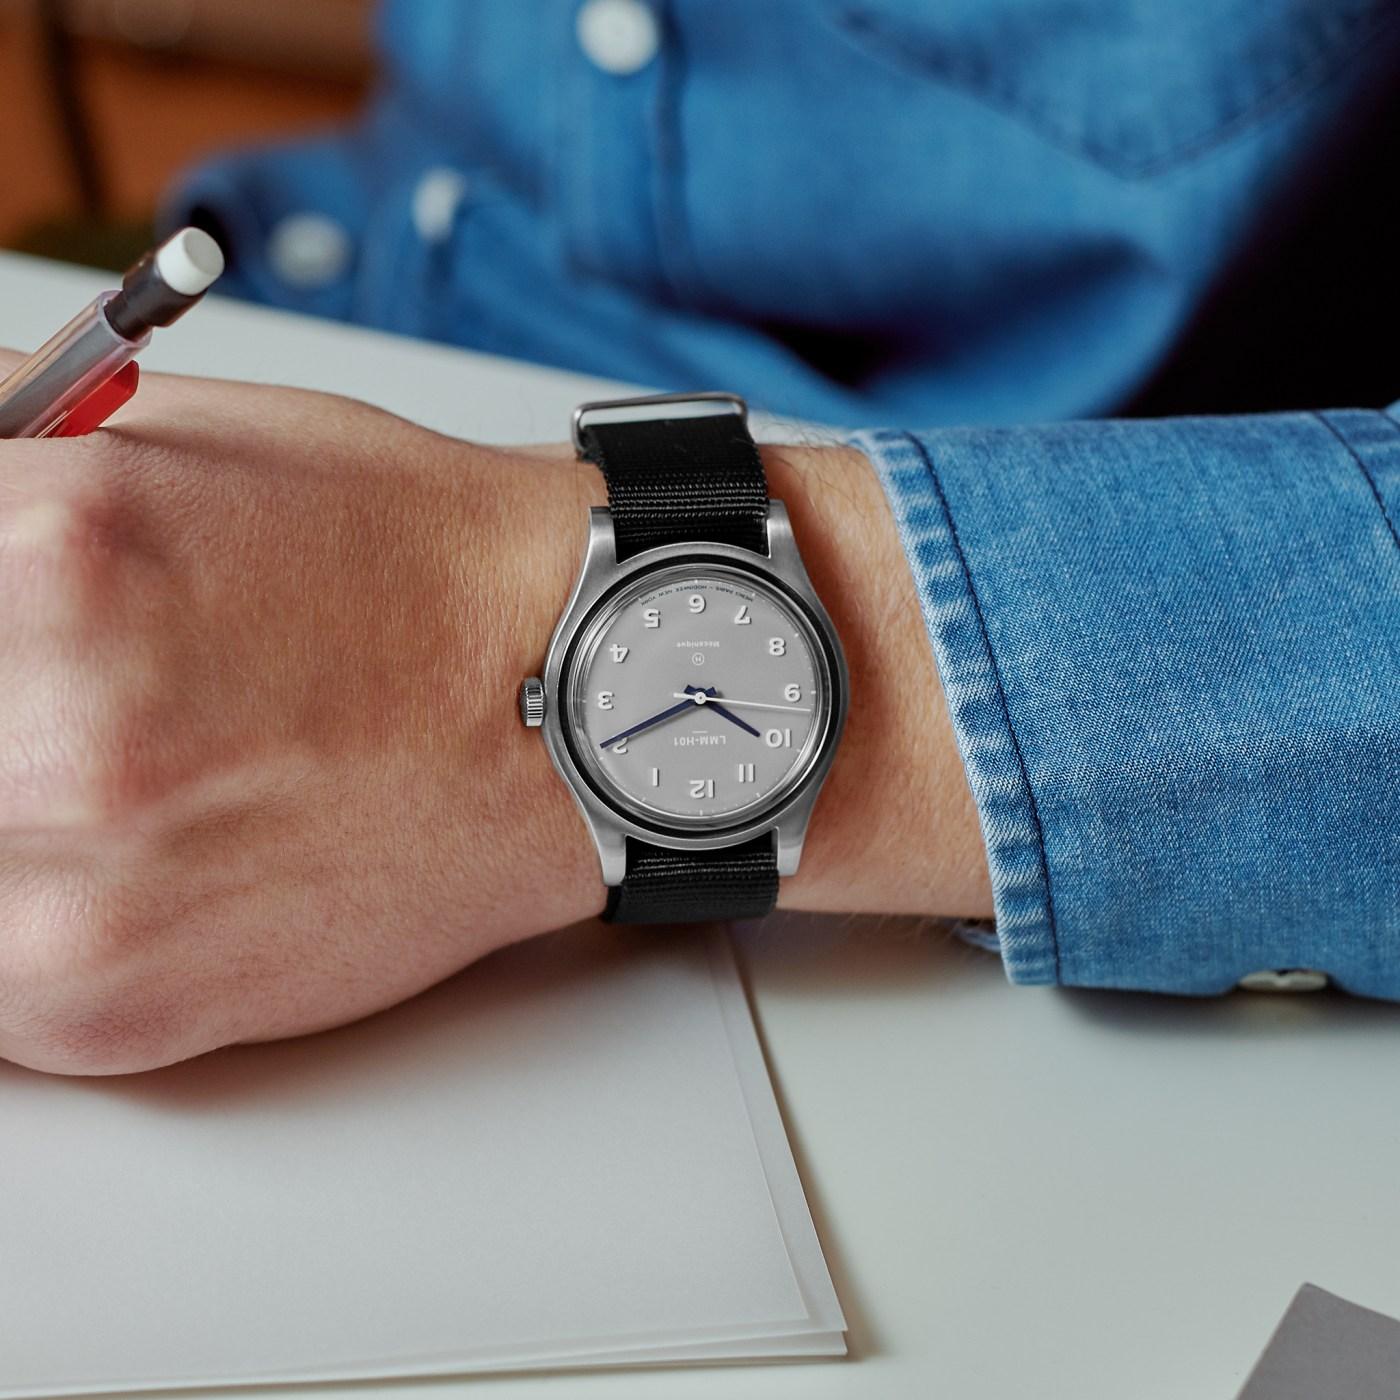 Merci LMM-H01 Hodinkee Limited Edition wristshot